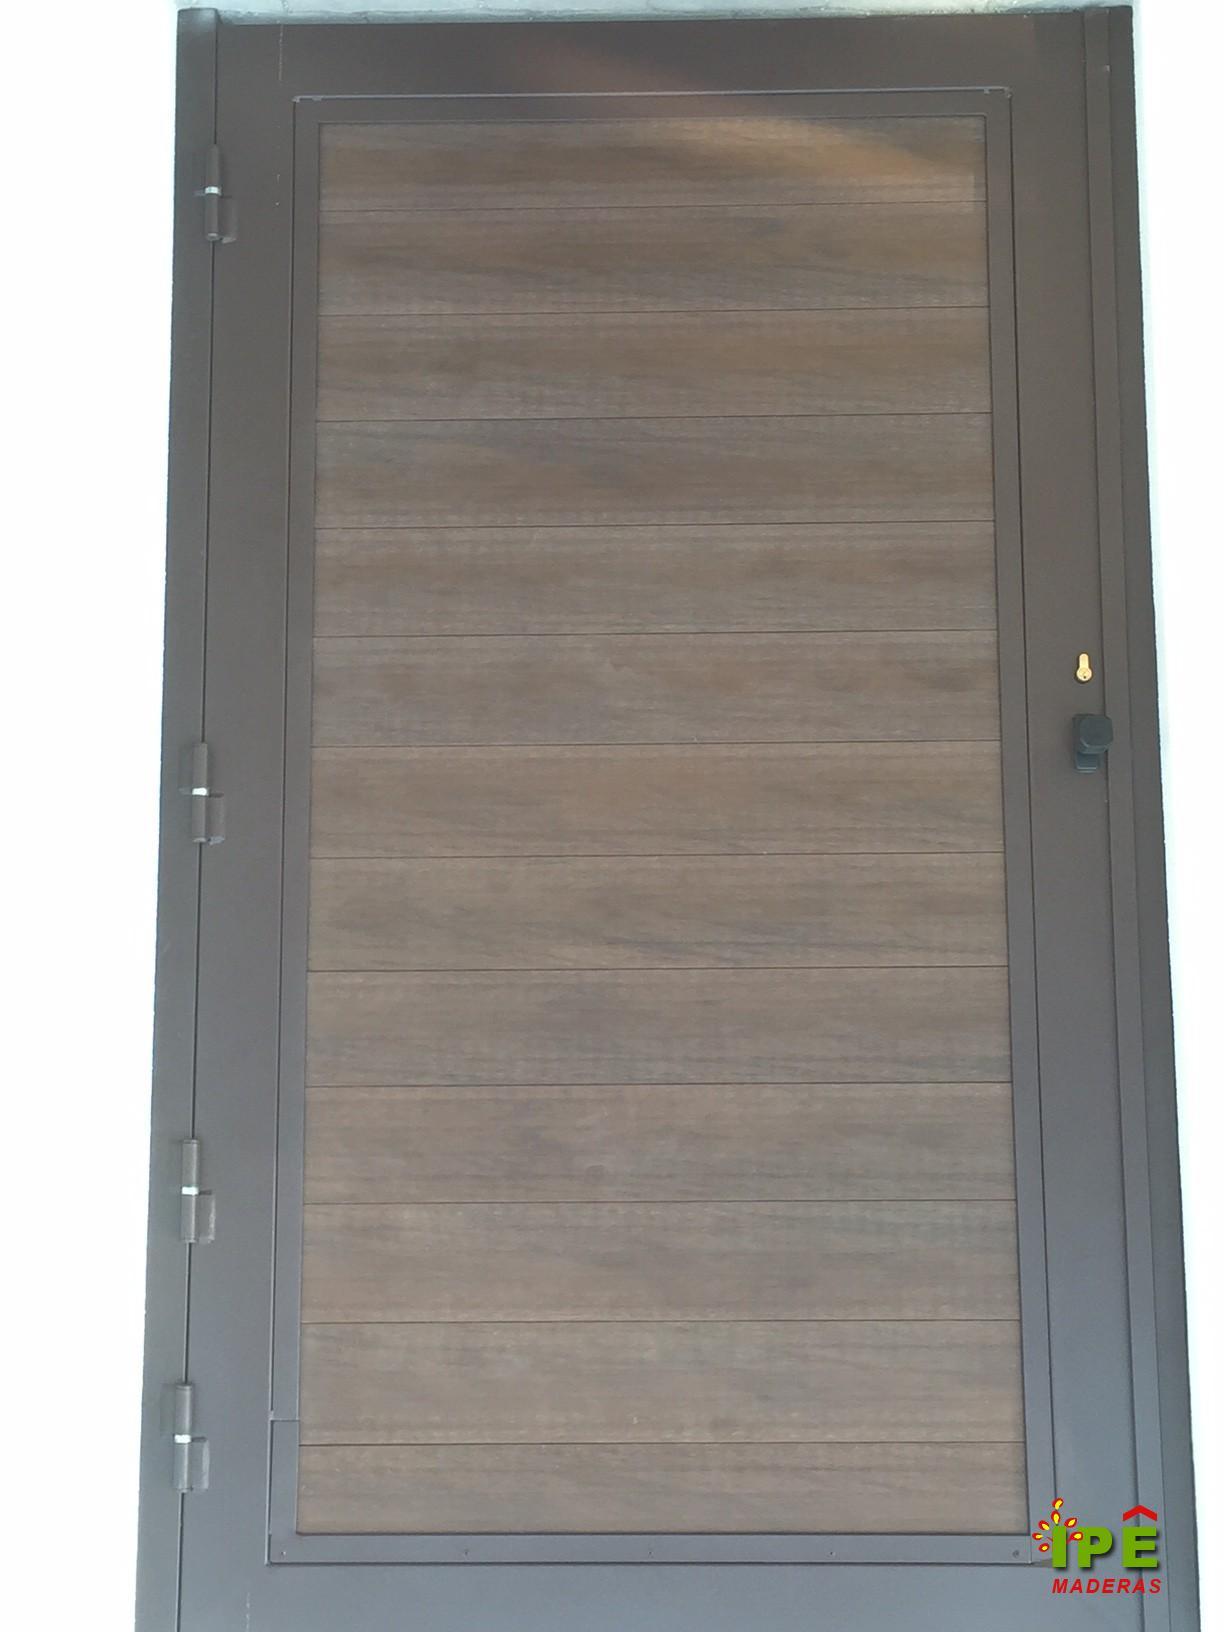 Marquesinas de madera para puertas de entrada excellent for Tarima exterior ikea